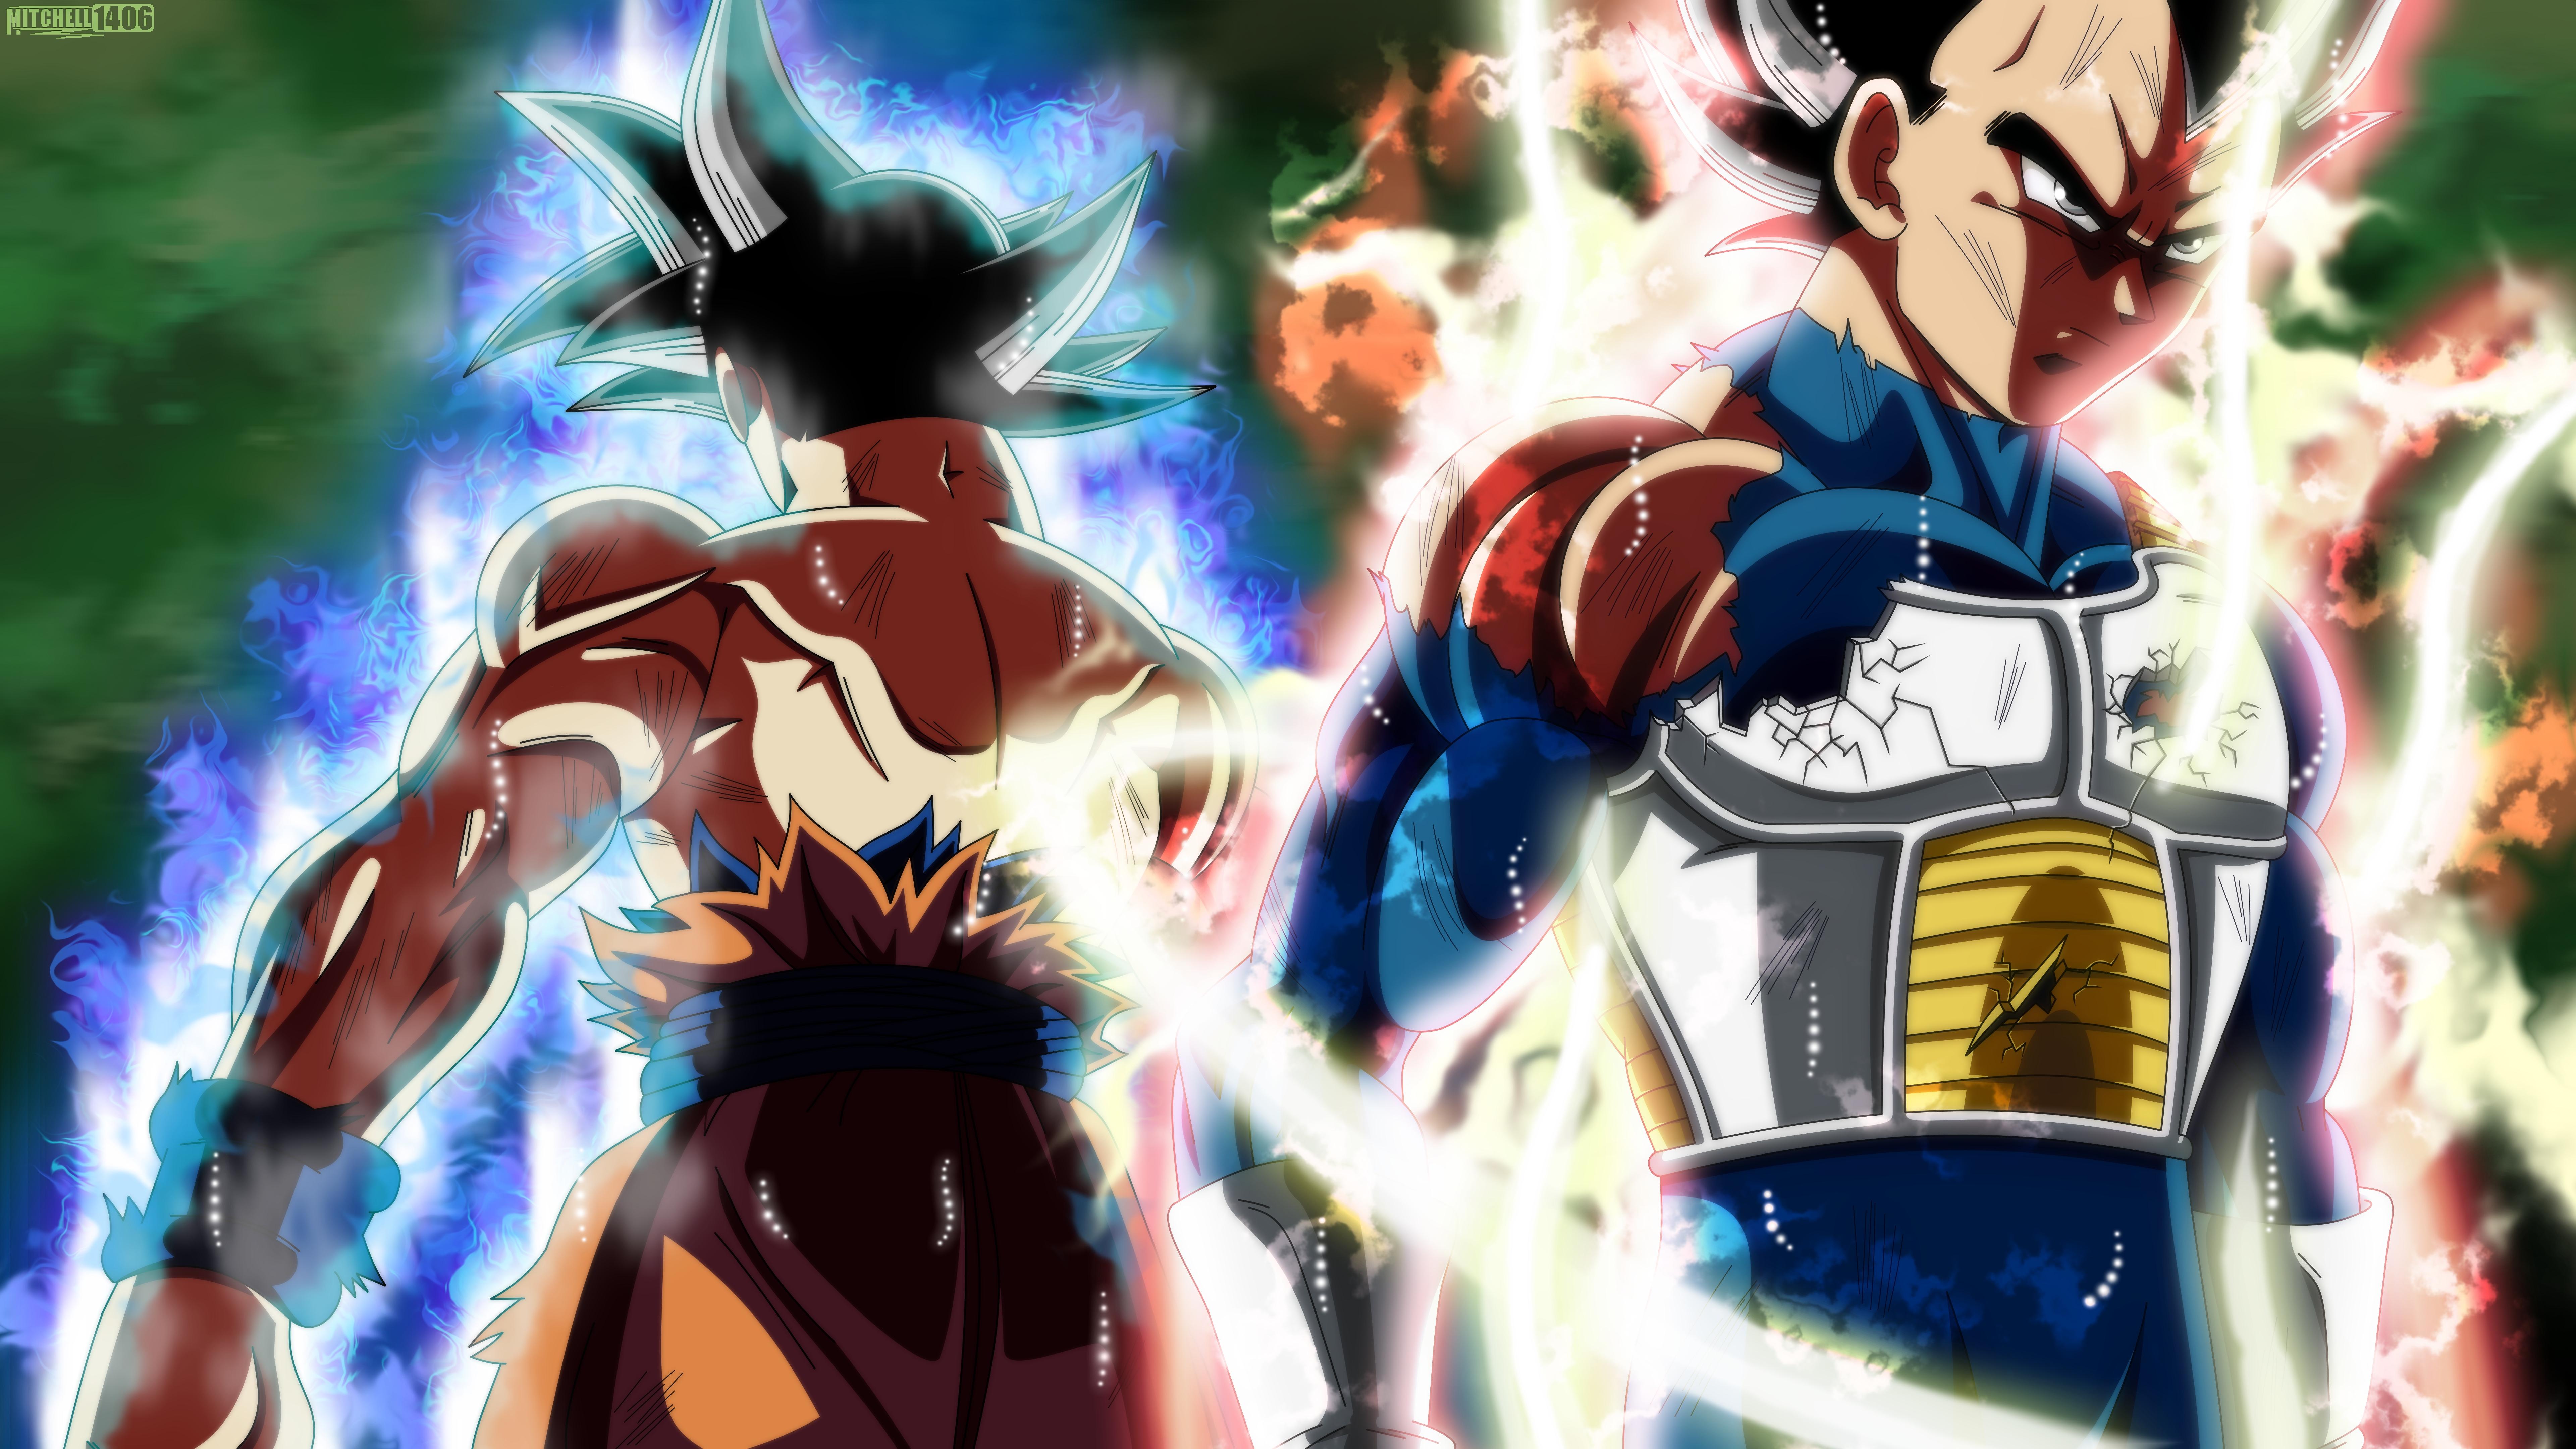 Goku and Vegeta Ultra Instinct 8k Ultra HD Wallpaper | Background Image | 7680x4320 | ID:993769 - Wallpaper Abyss